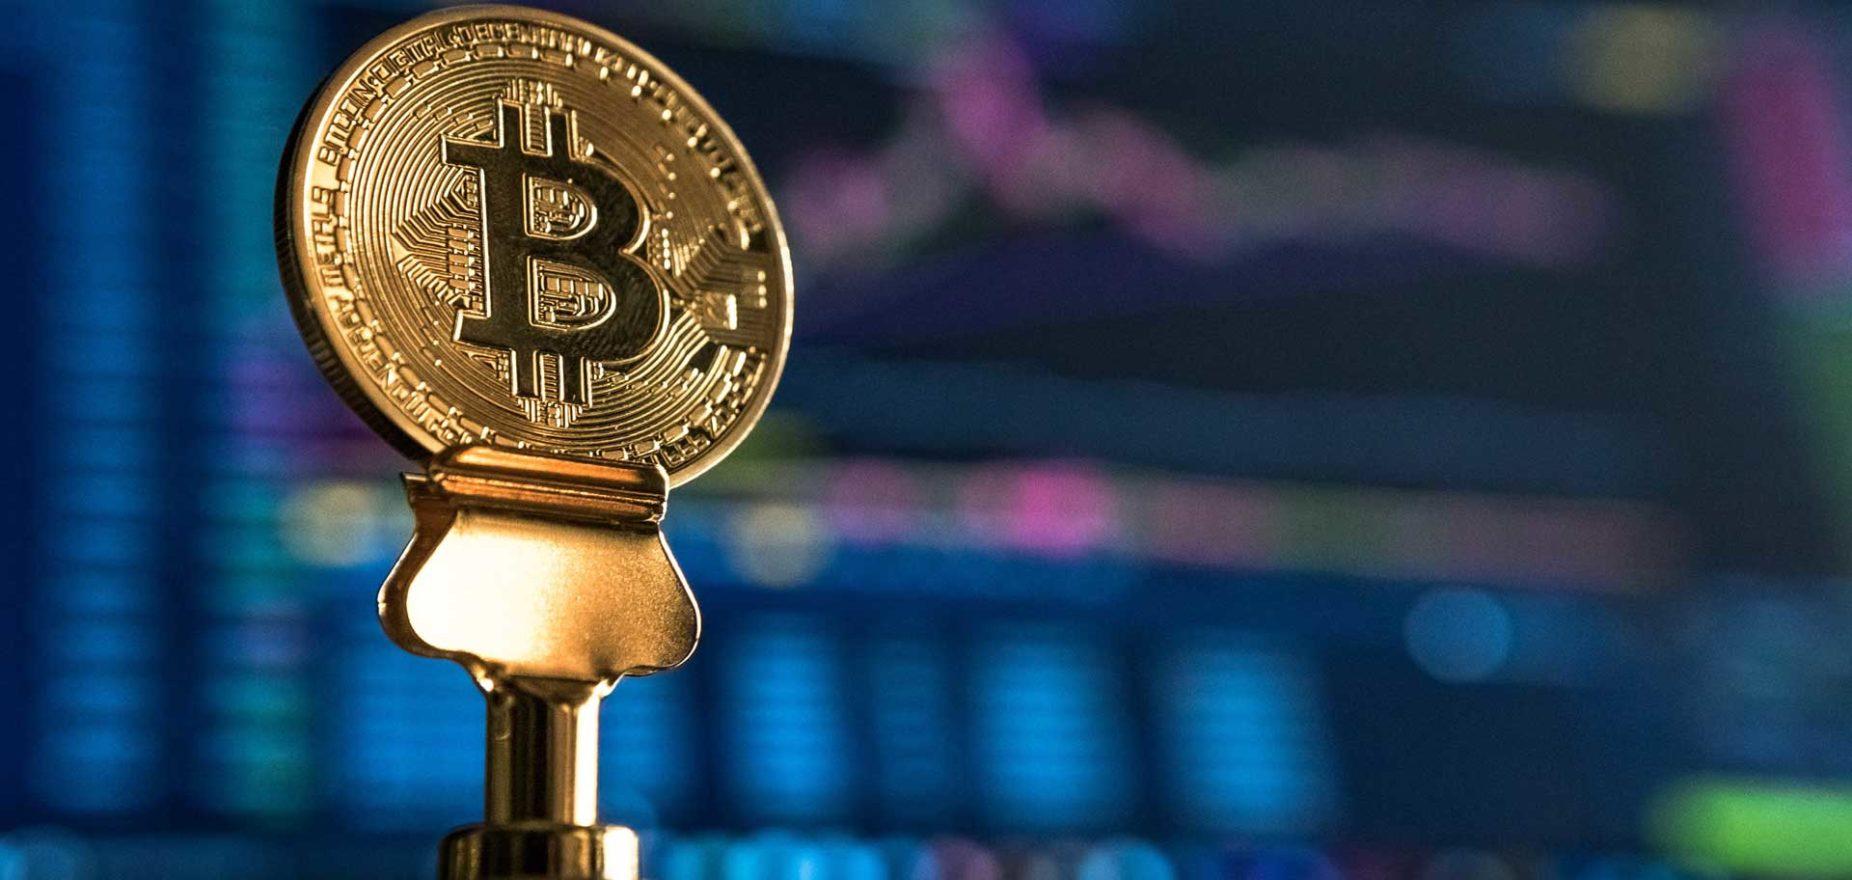 18th million bitcoin btc mining